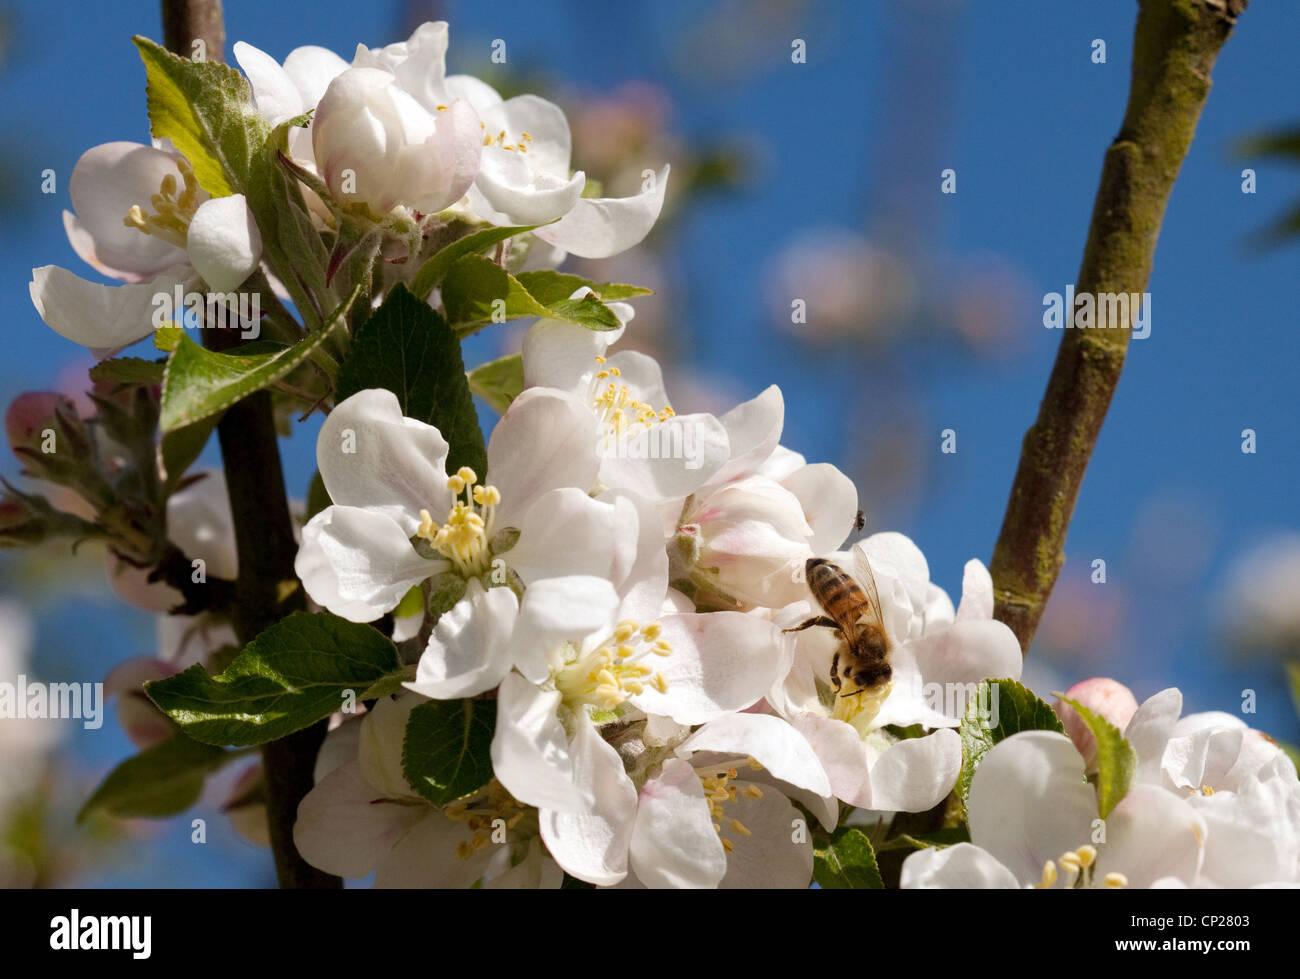 Western Honey Bee (Apis Mellifera) on apple blossom, UK - Stock Image